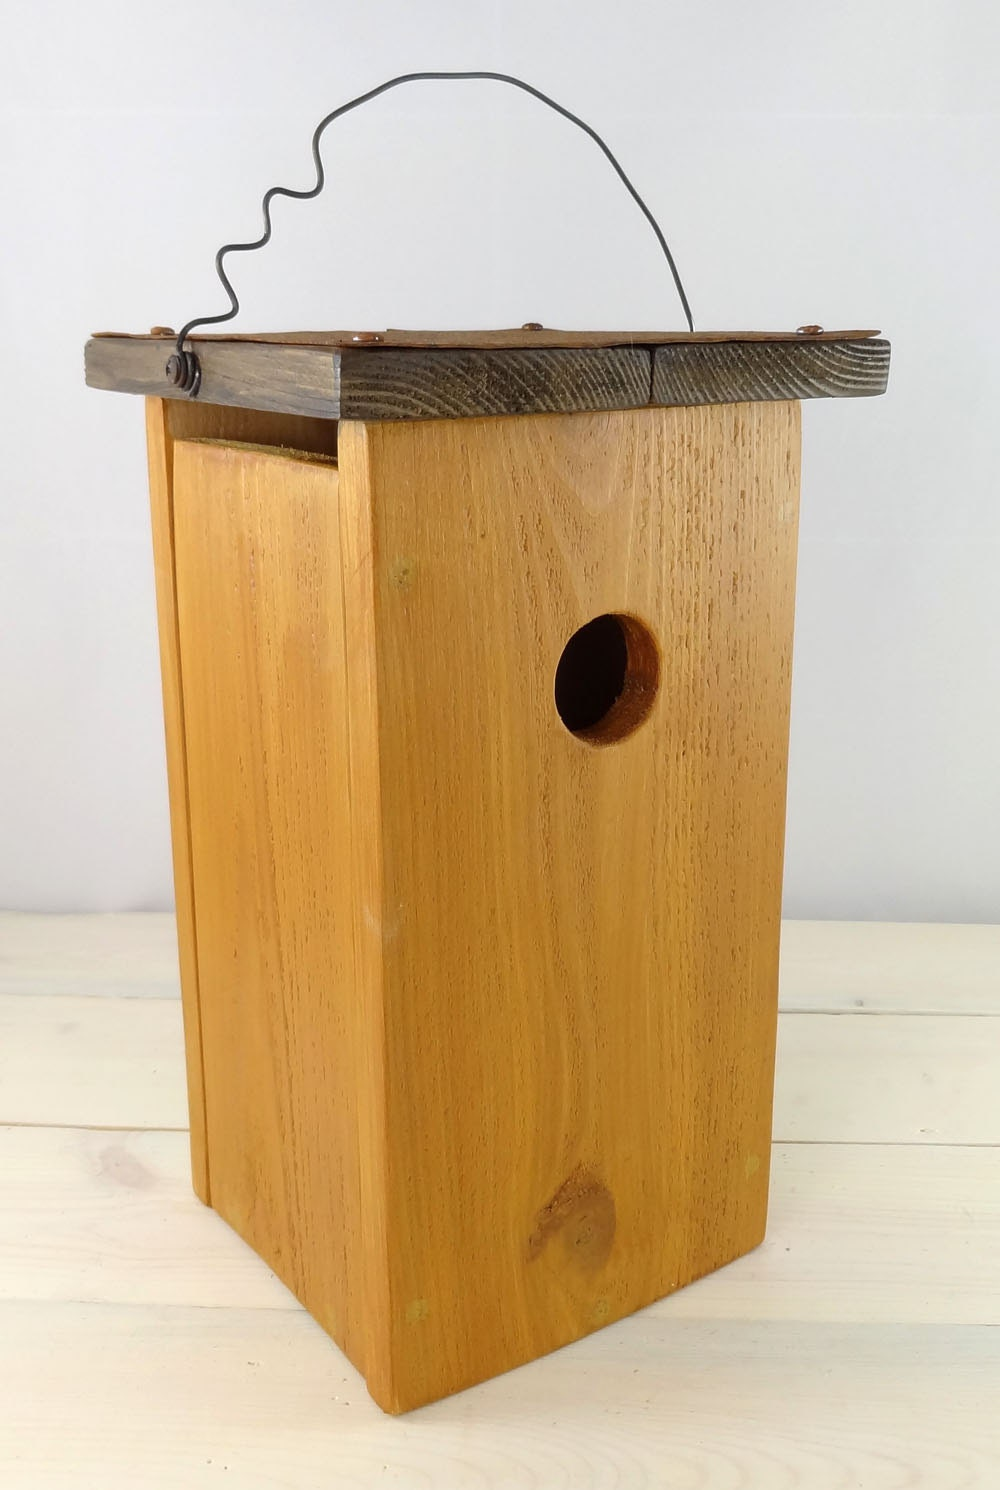 Modern Bird House Handcrafted Outdoor Wooden Bird Houses For